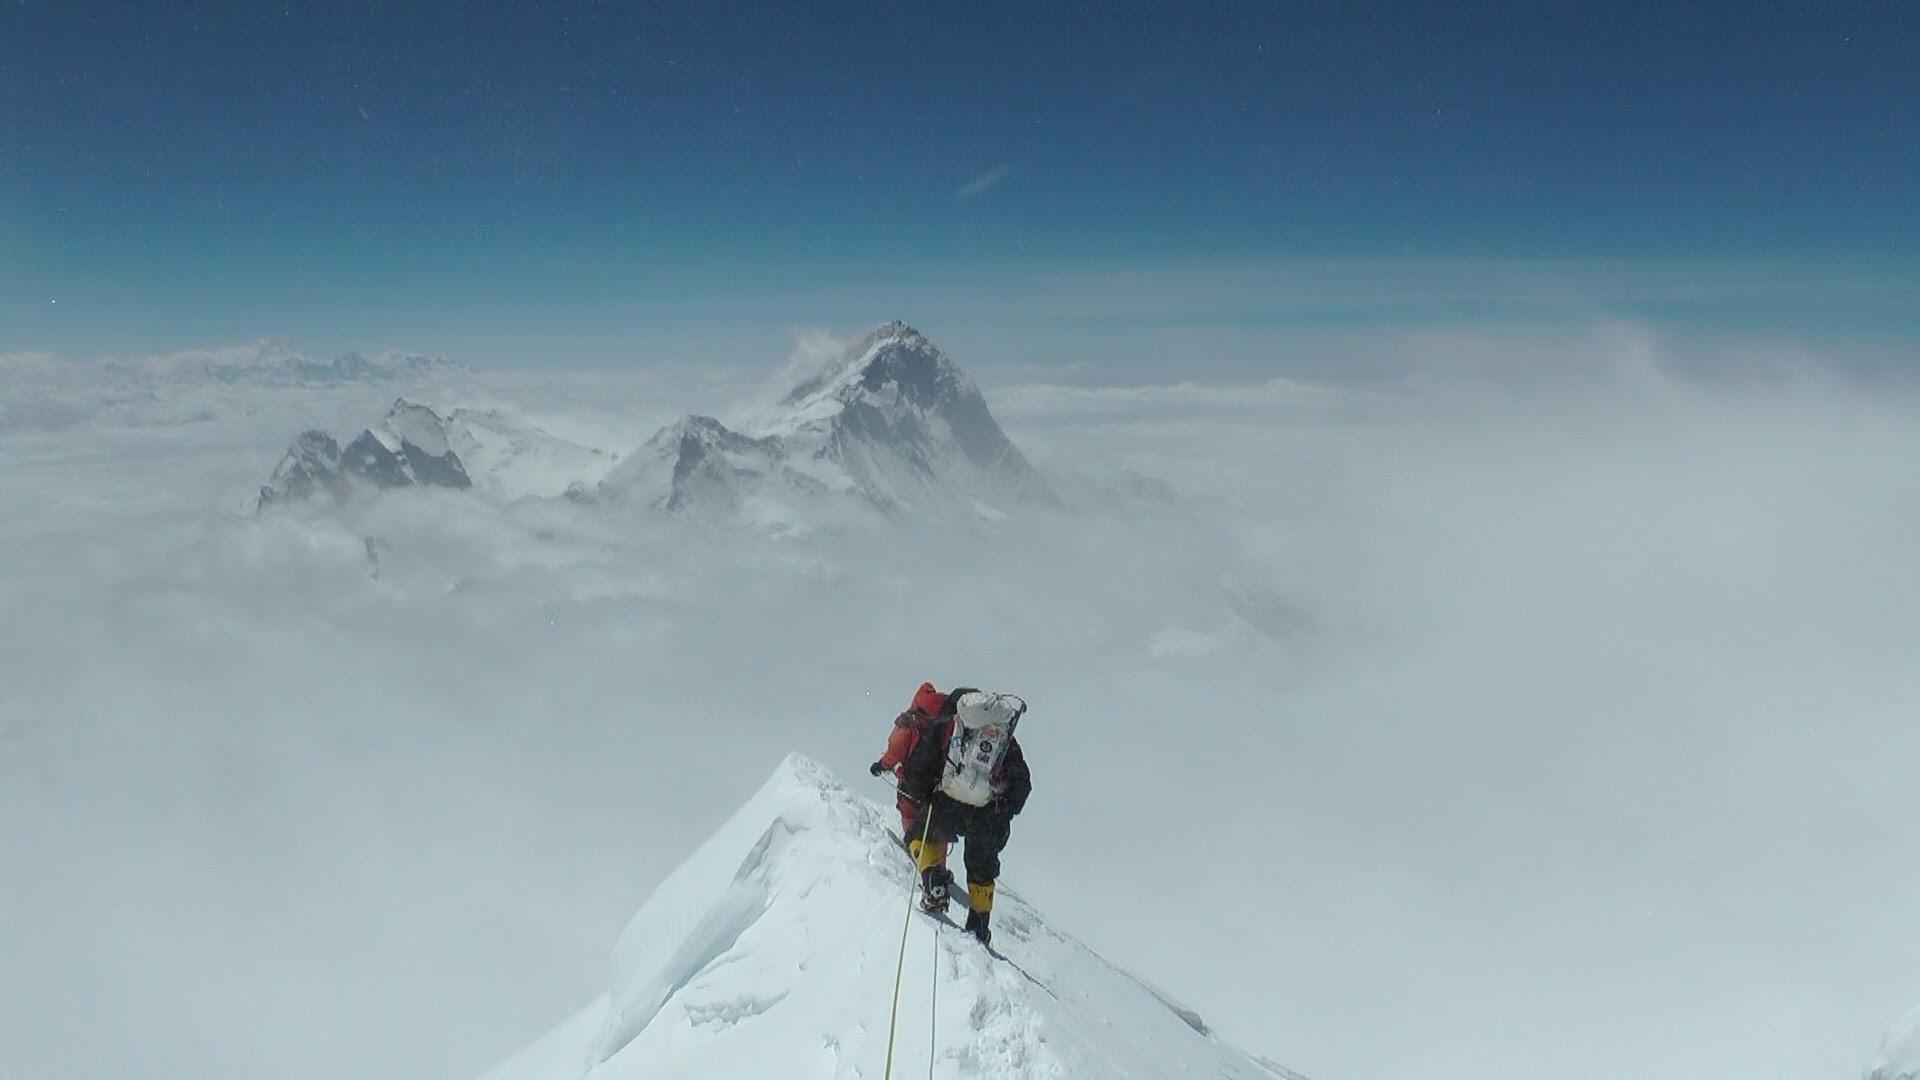 Mount Everest Wallpaper HD (60+ images)